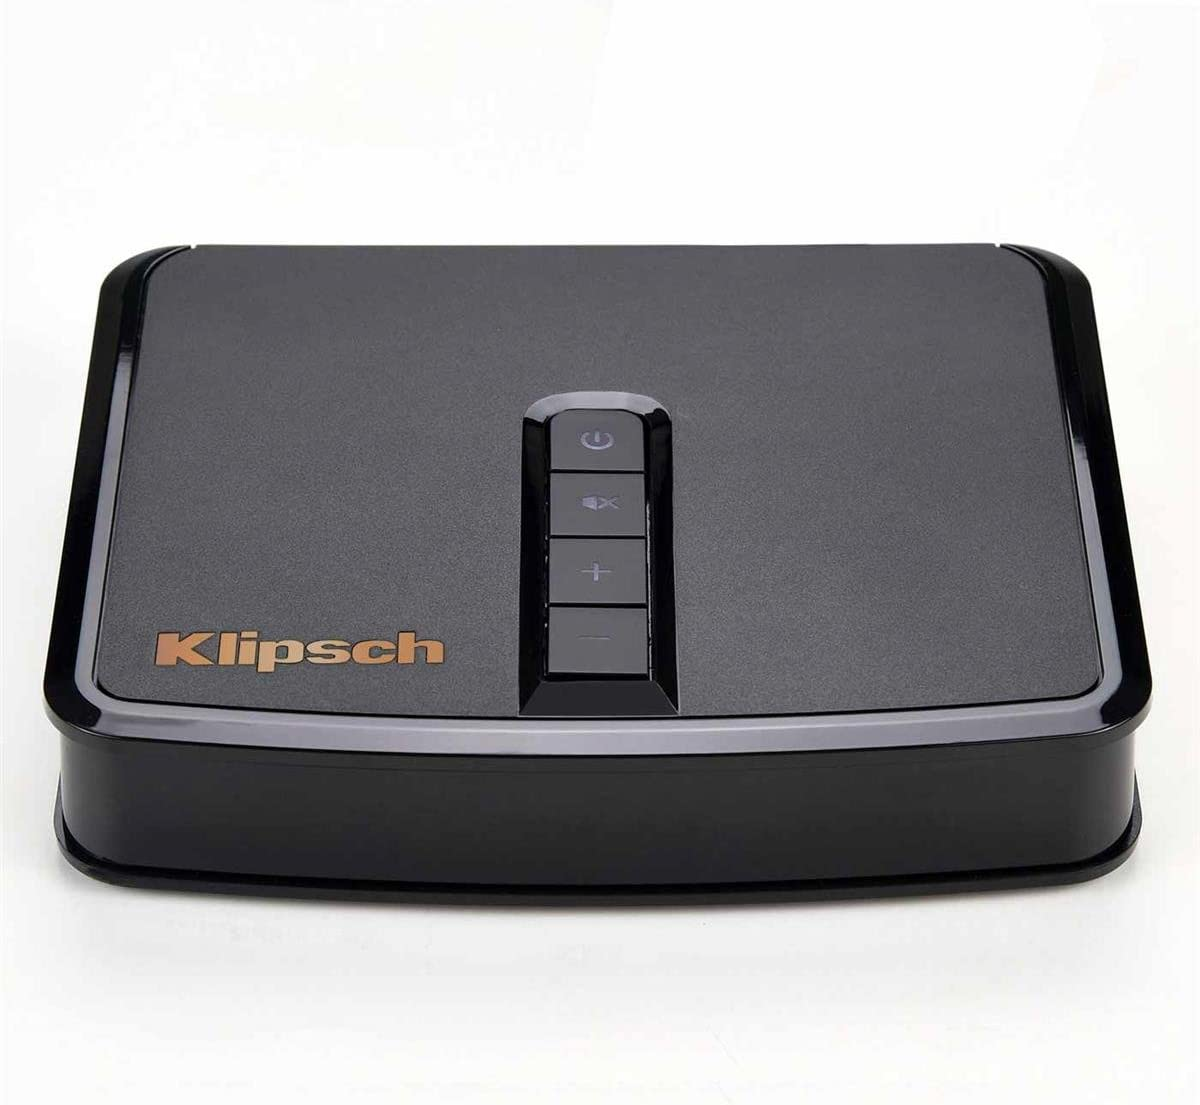 Klipsch 1063275 Gate Playfi Gateway Wireless Multi Room Hub,Black